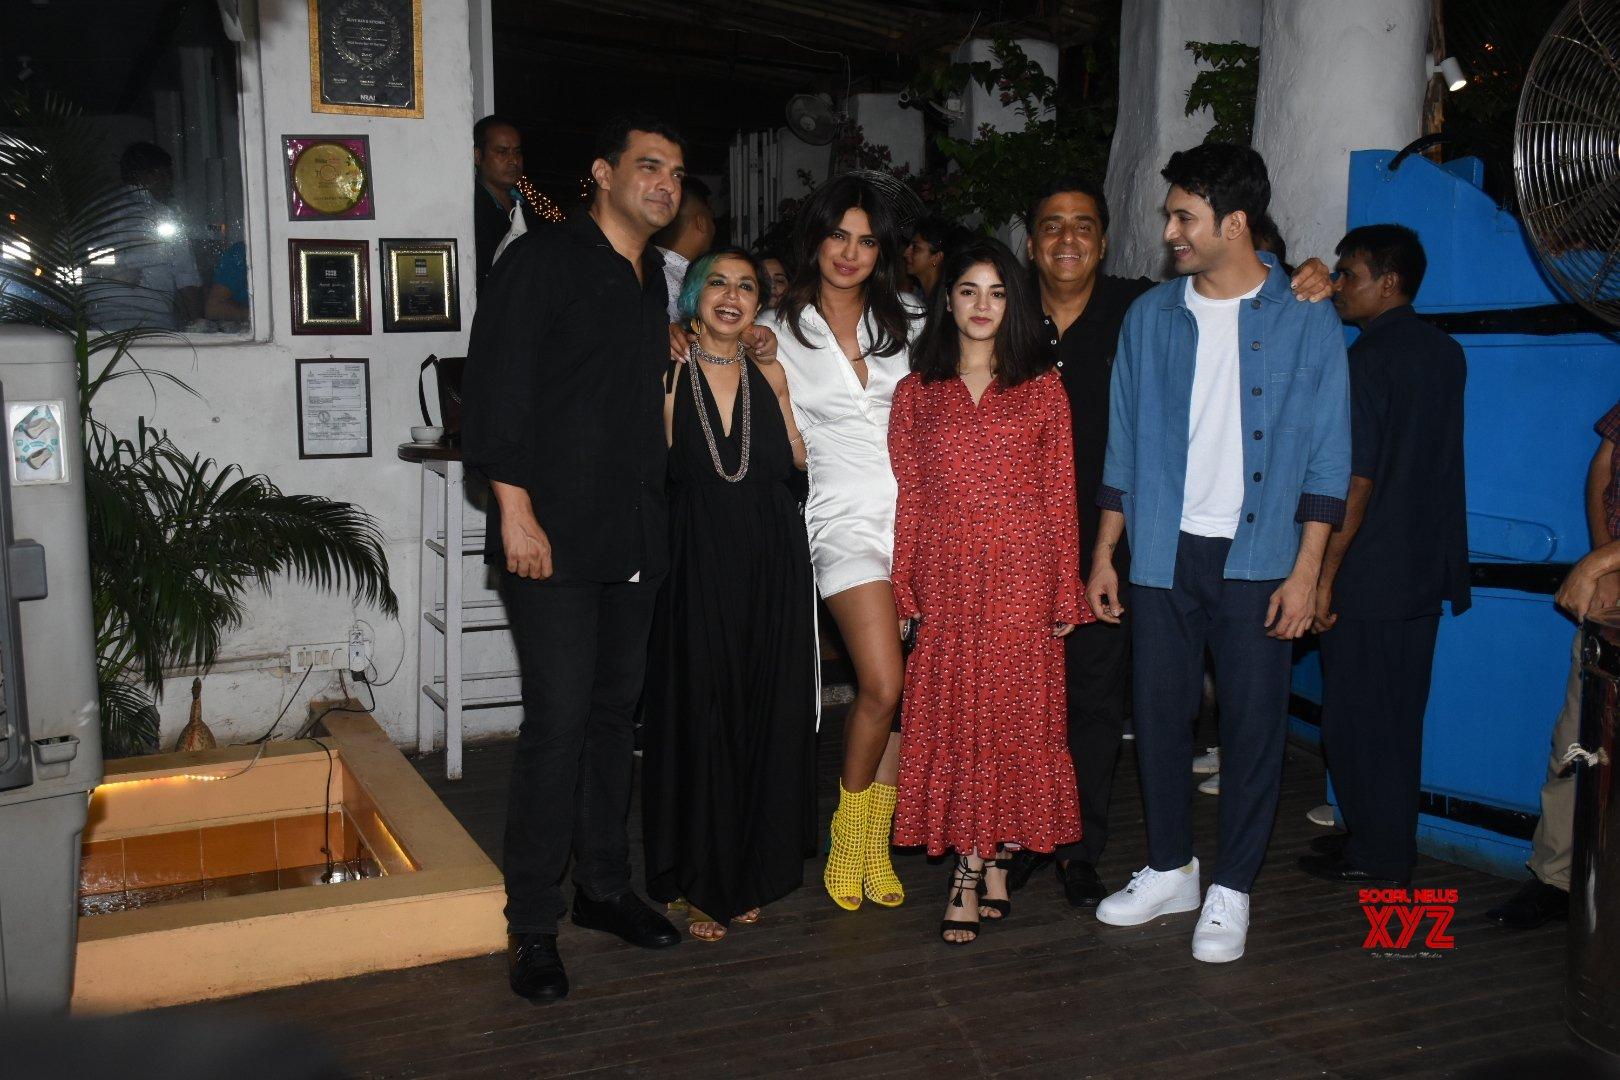 "Mumbai: Film ""The Sky Is Pink"" wrap - up party - Priyanka Chopra, Zaira Wasim, Rohit Saraf, Shonali Bose, Ronnie Screwvala, Siddharth Roy Kapur #Gallery"